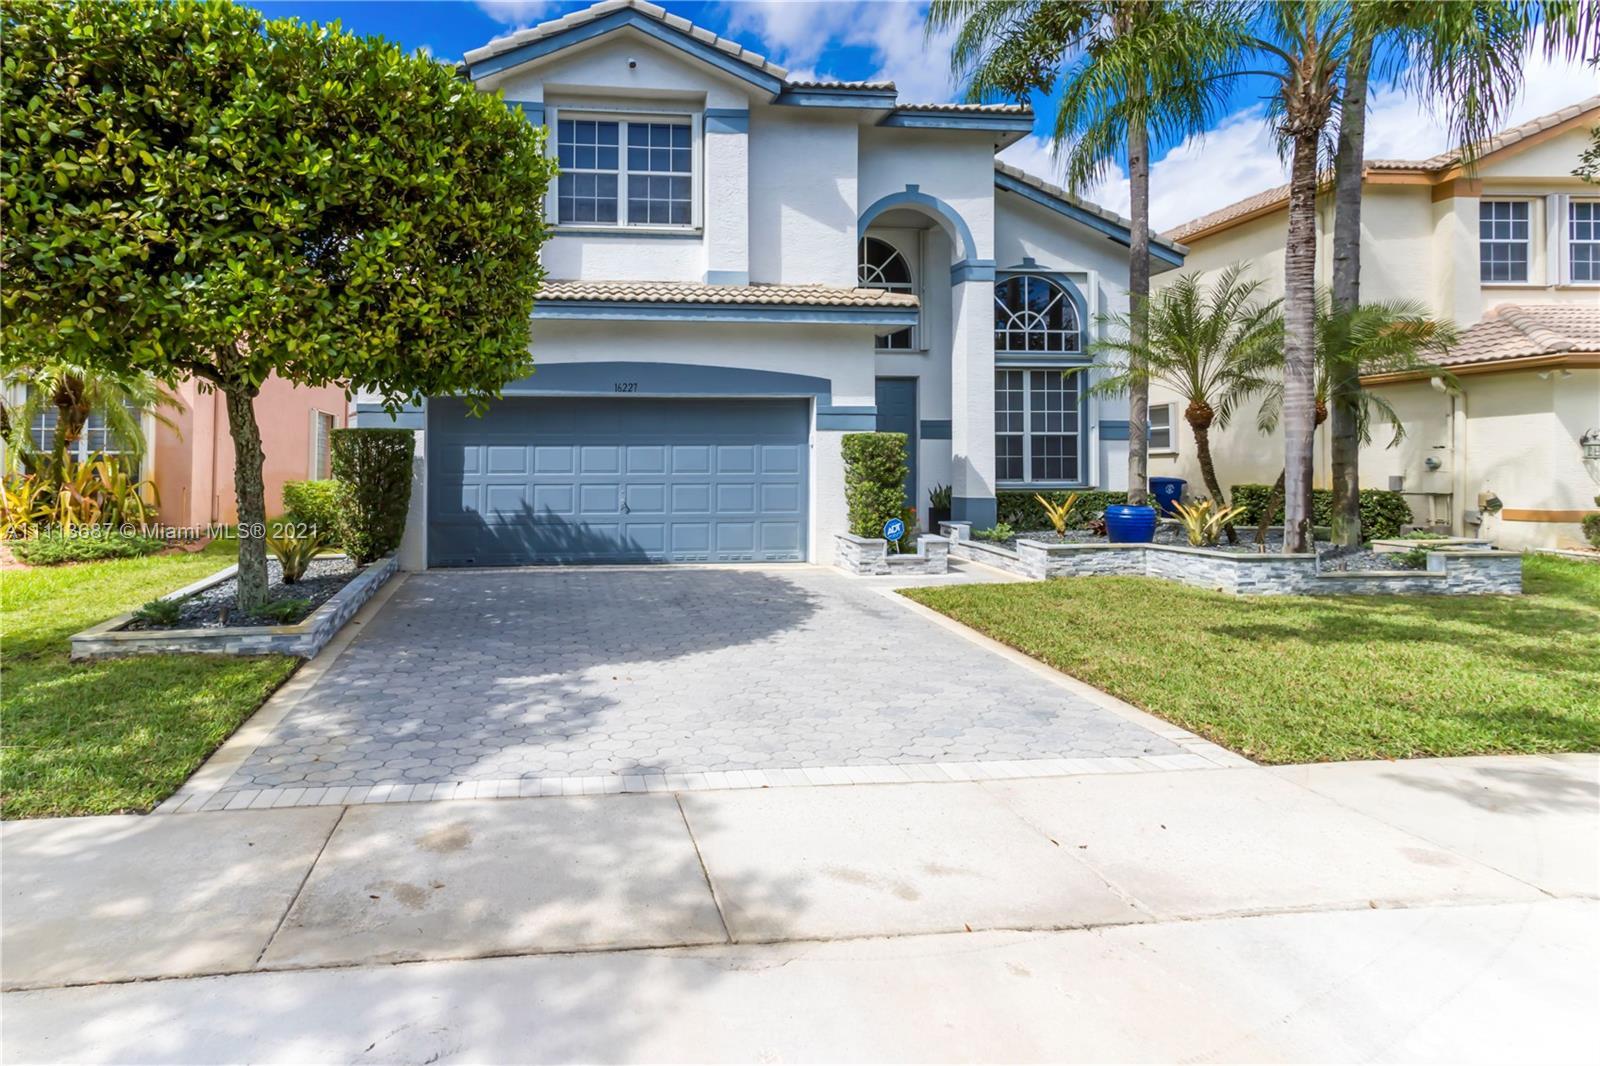 Silver Shores - 16227 SW 20th St, Miramar, FL 33027